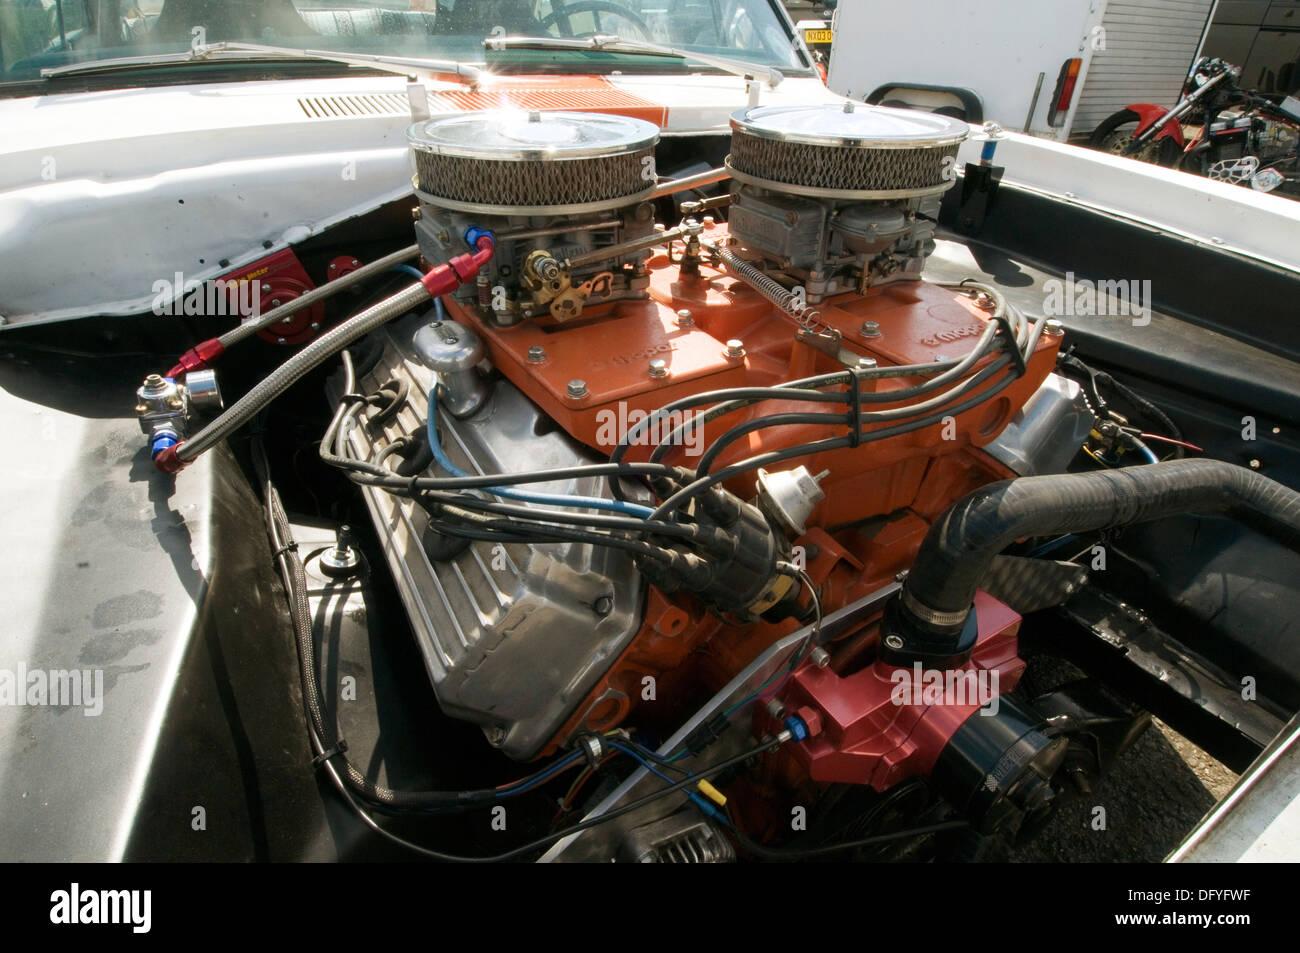 chrysler hemi muscle car classic cars engine engine huge massive